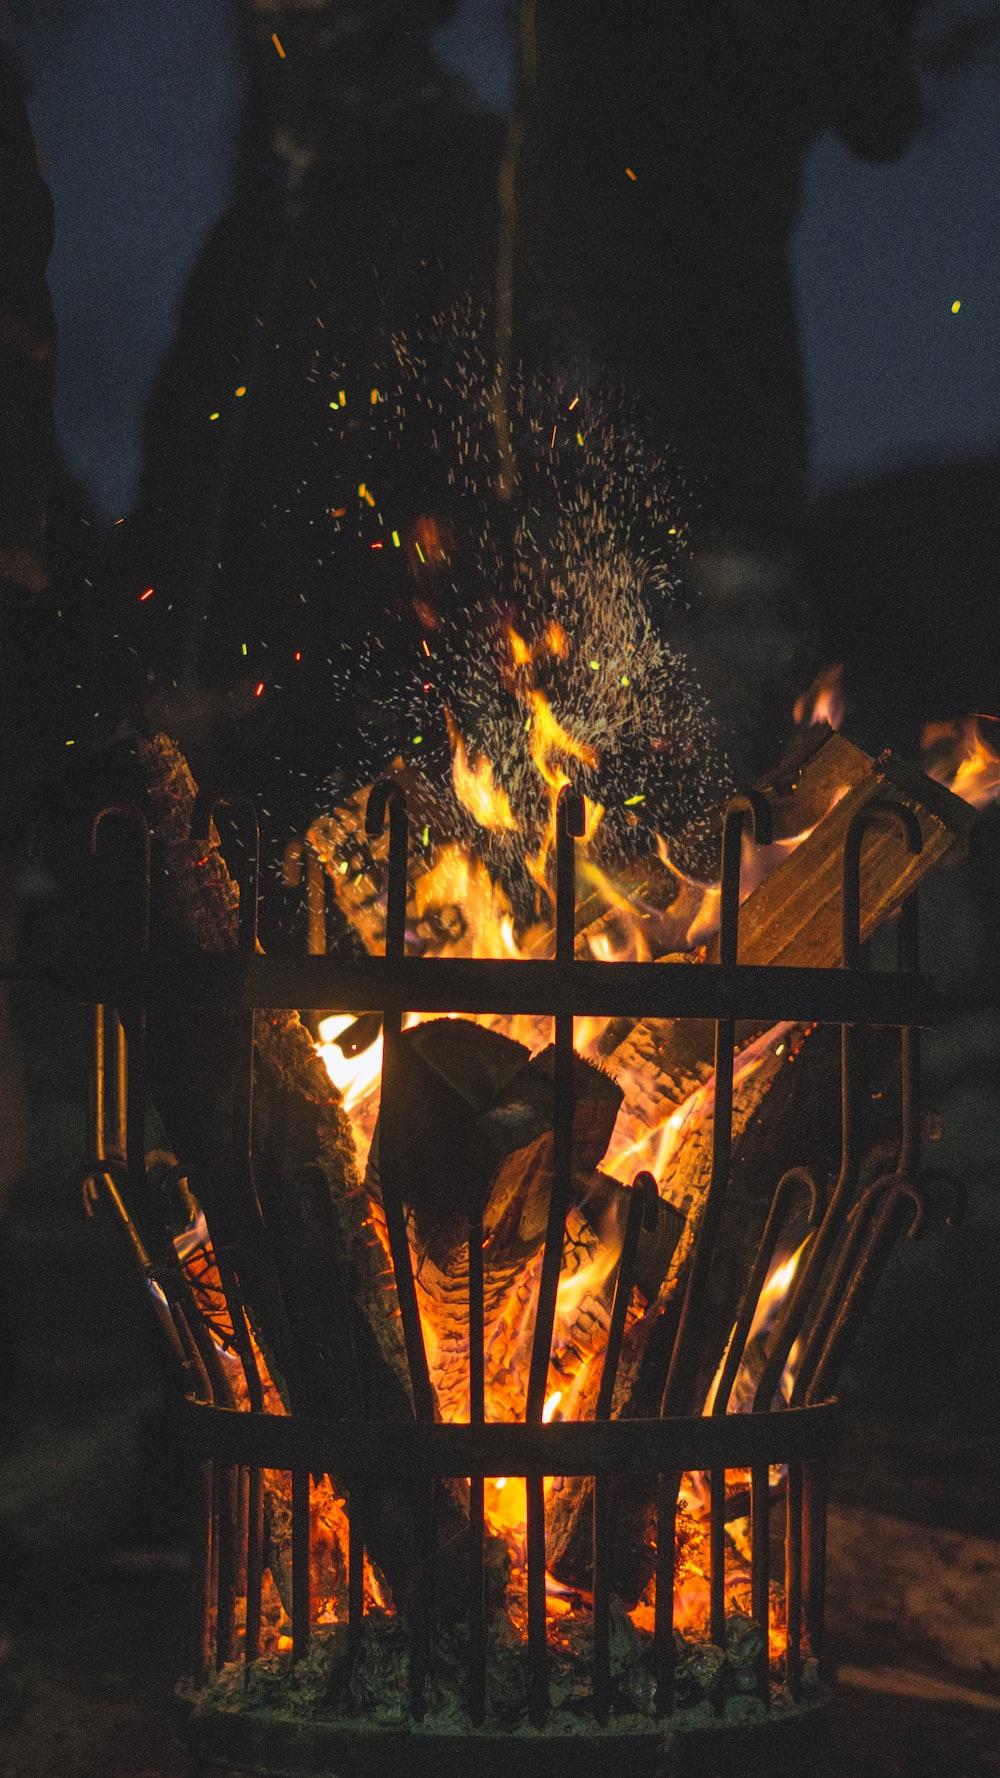 lighted bonfire